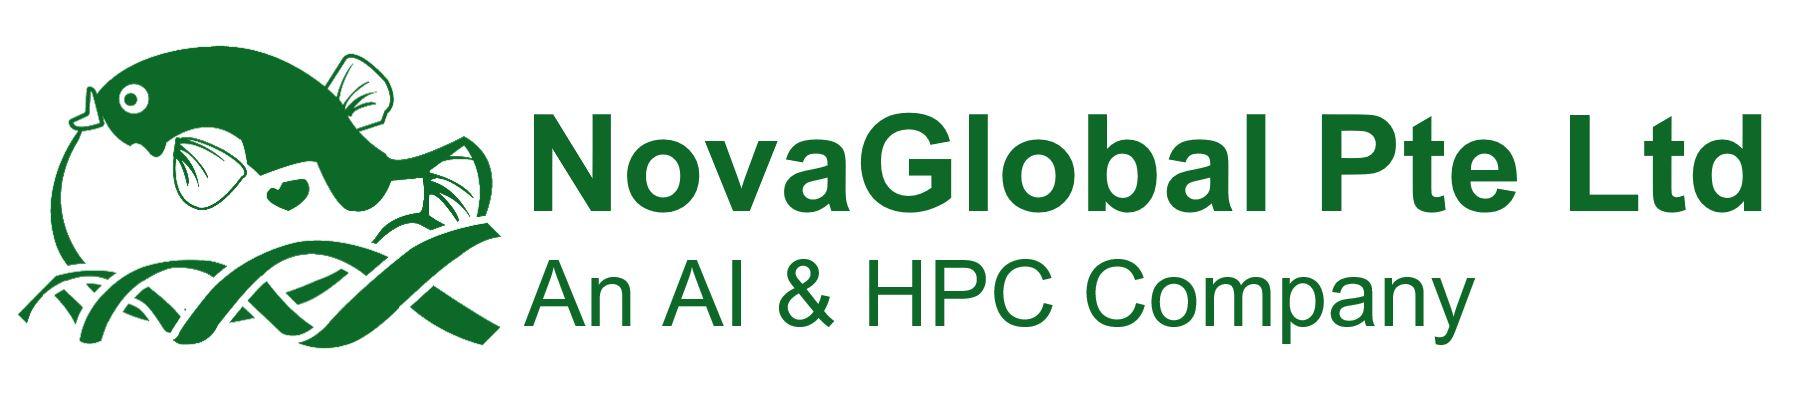 An AI & HPC Company